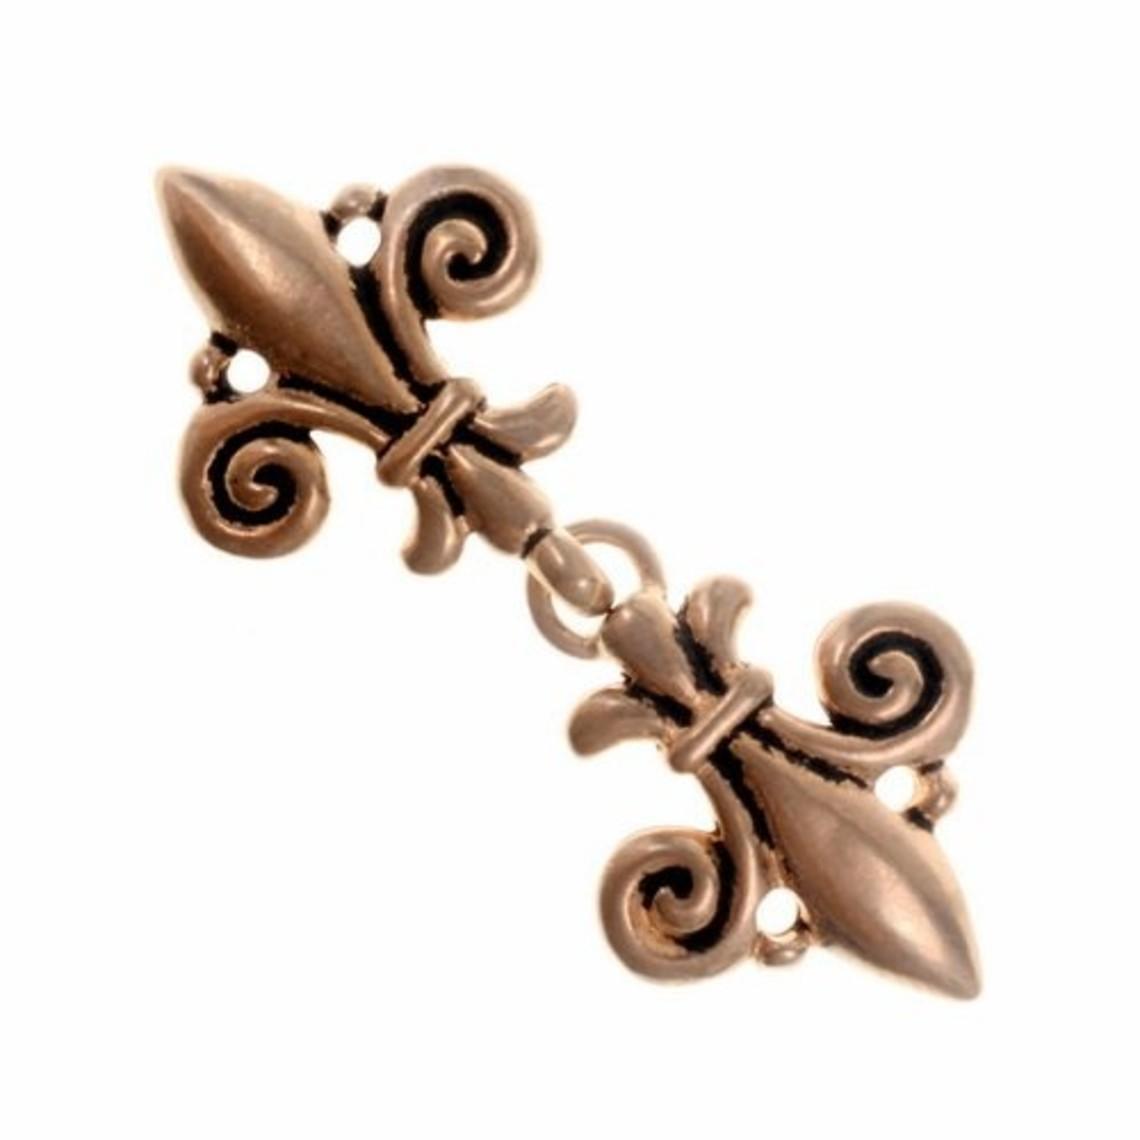 Capa broche de la flor de lis, bronce